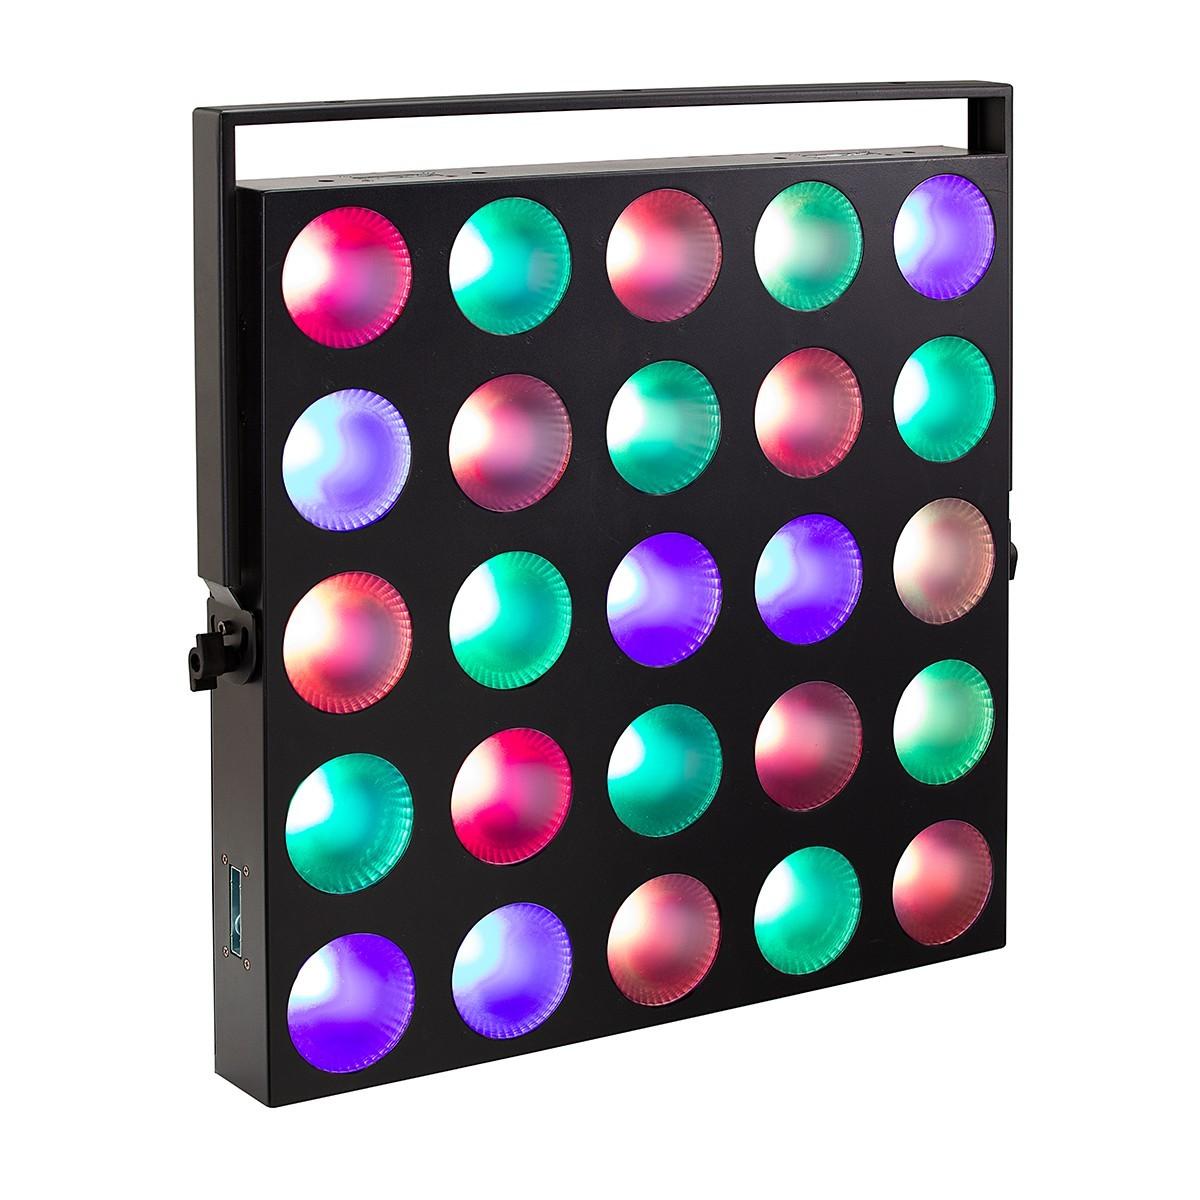 SET 4 MATRIX BLINDER SOUNDSATION MTR-25-10W-RGBW CON FLIGHT CASE